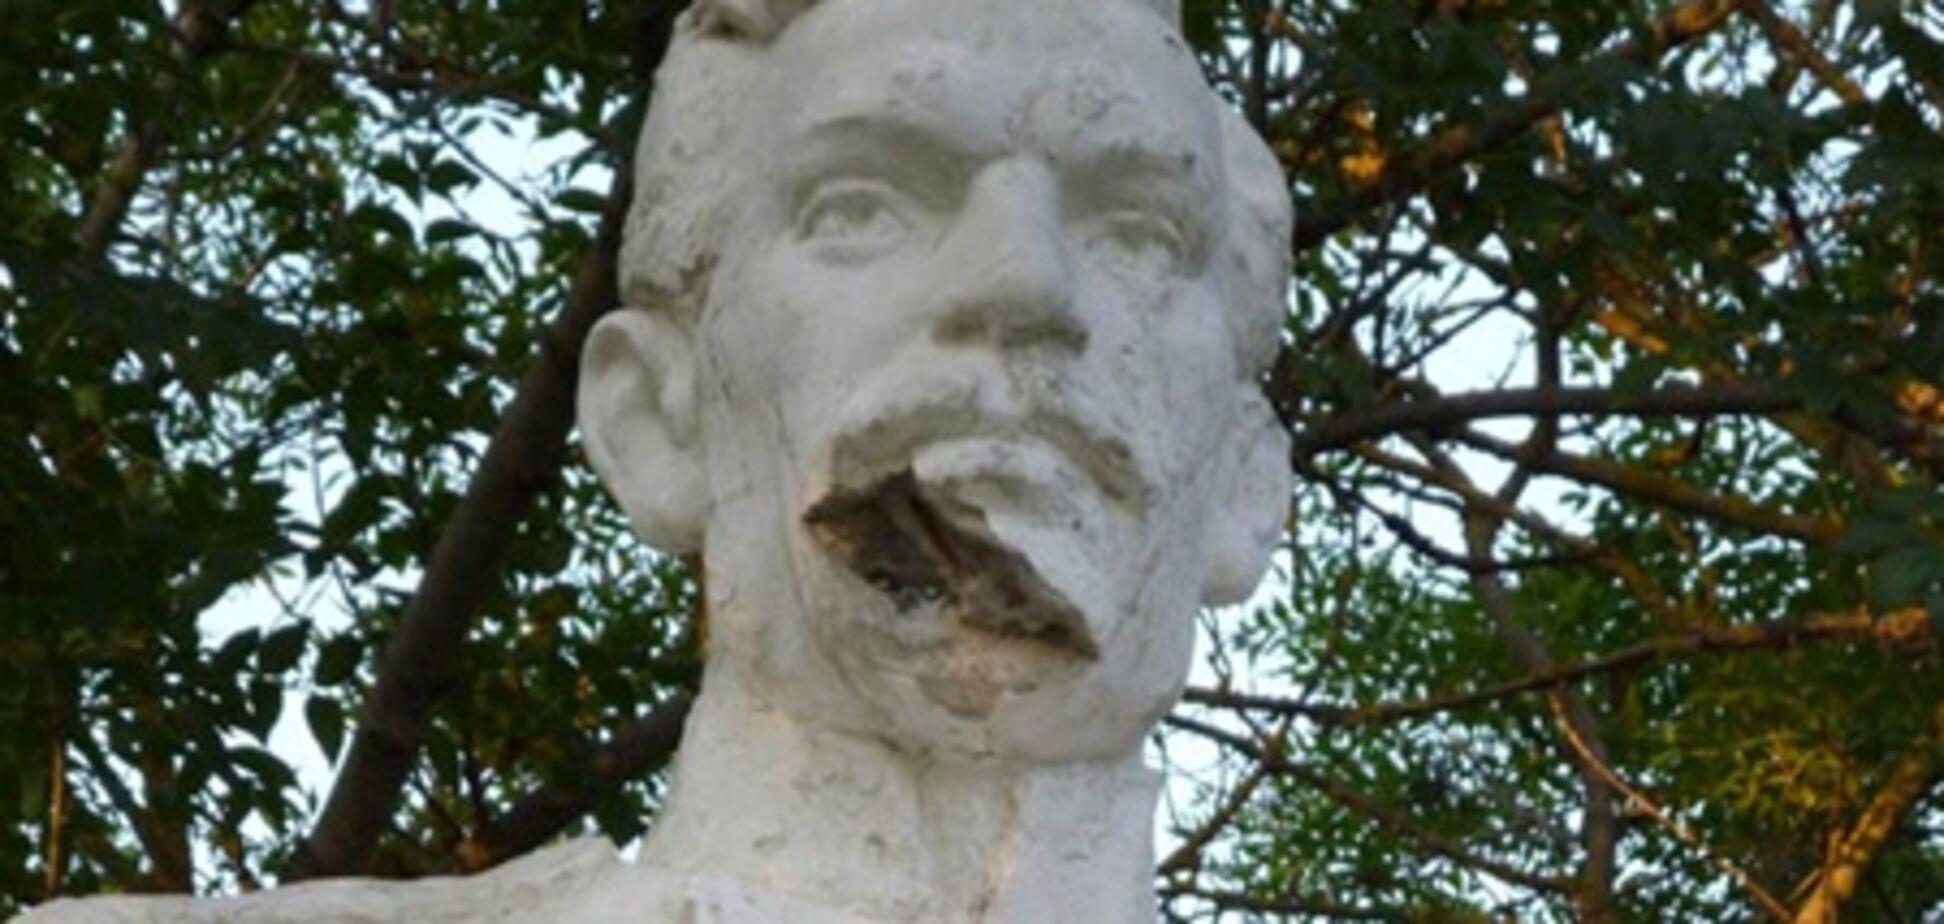 У Криму вандали пошкодили пам'ятник Толстому